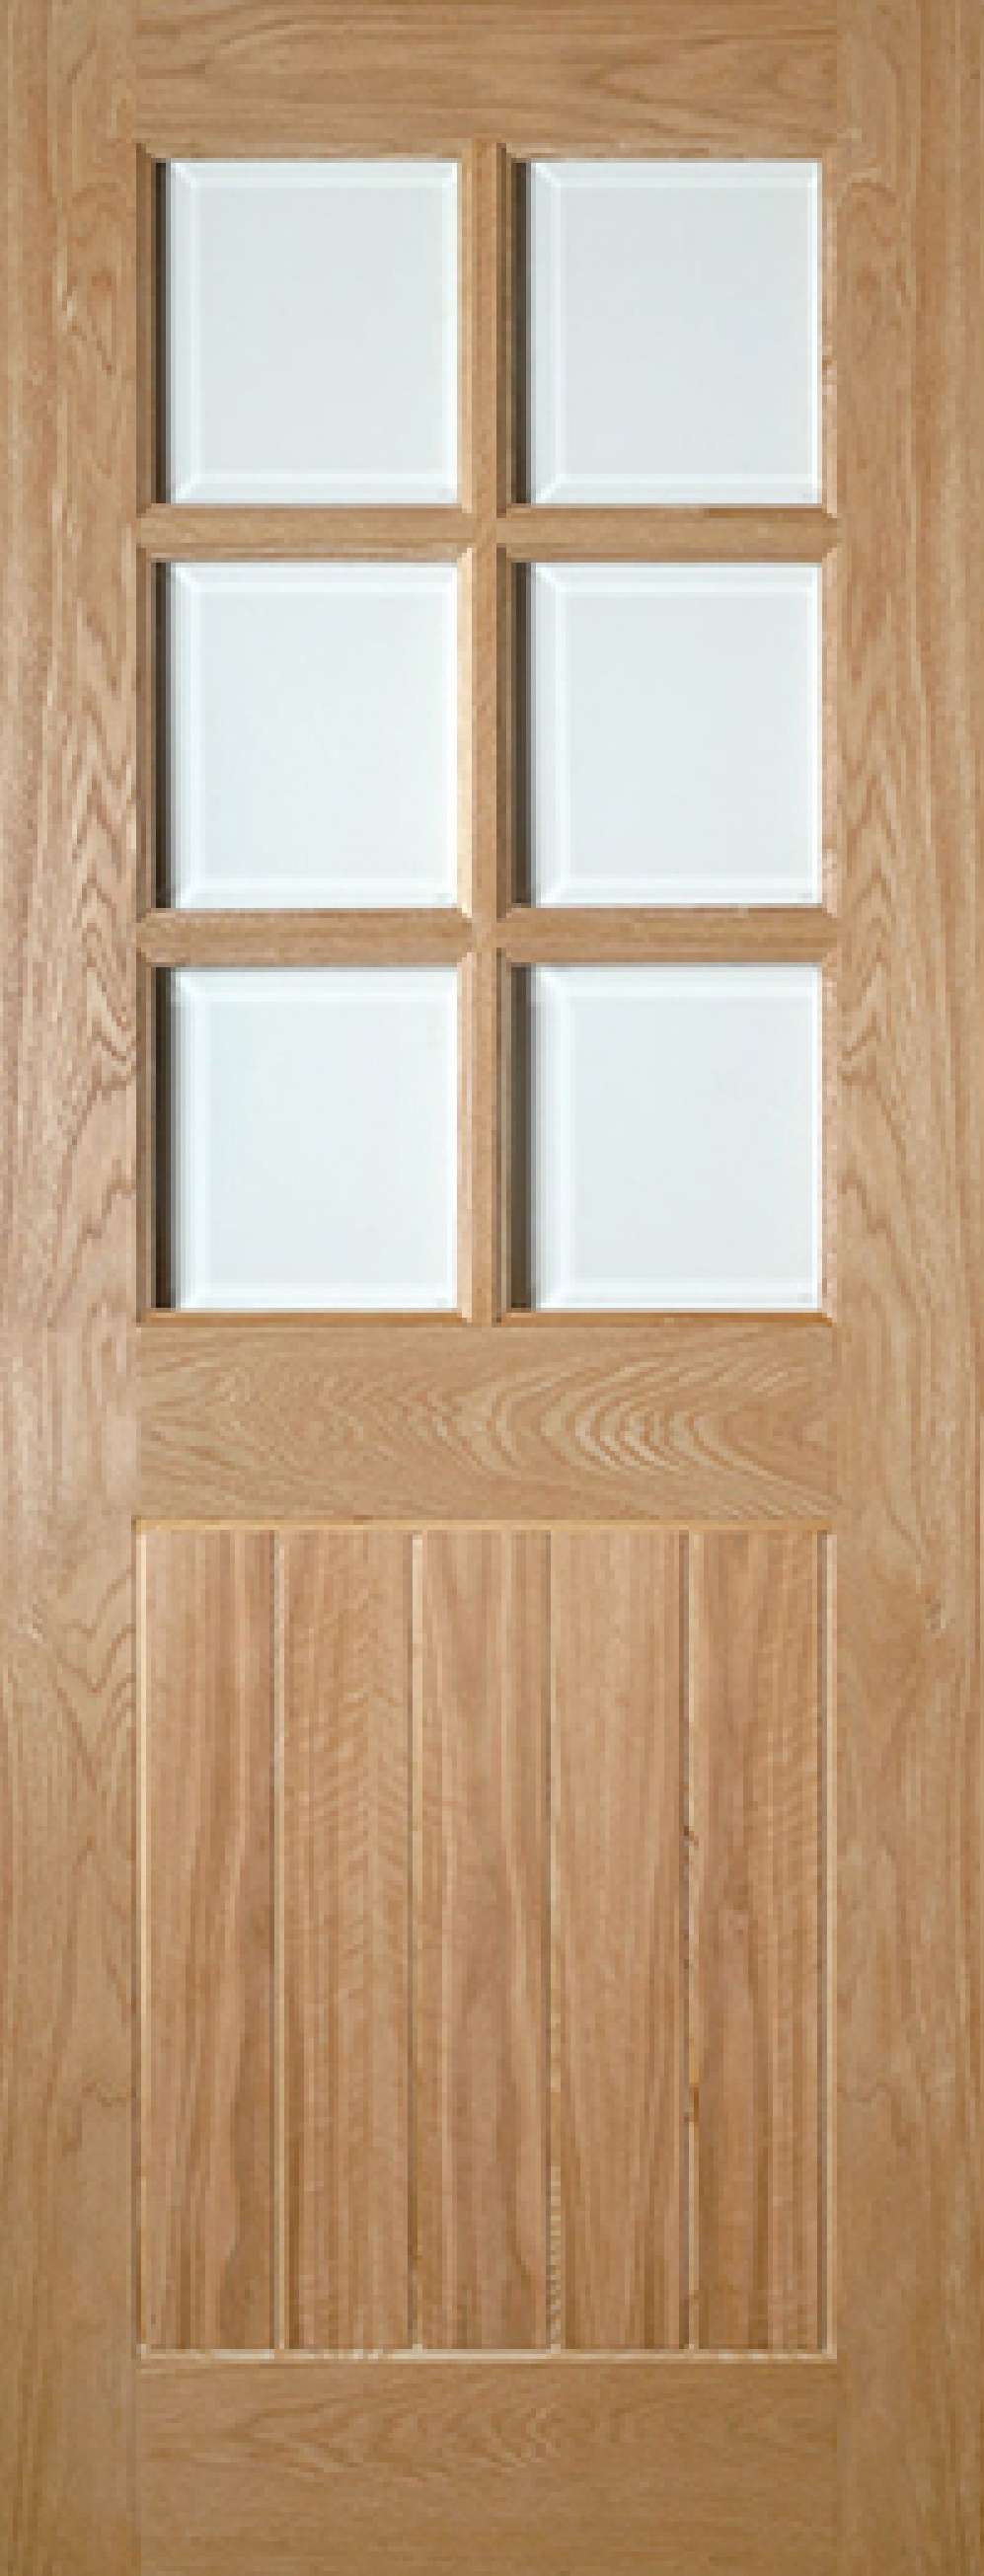 Ely Glazed Oak Door - Prefinished